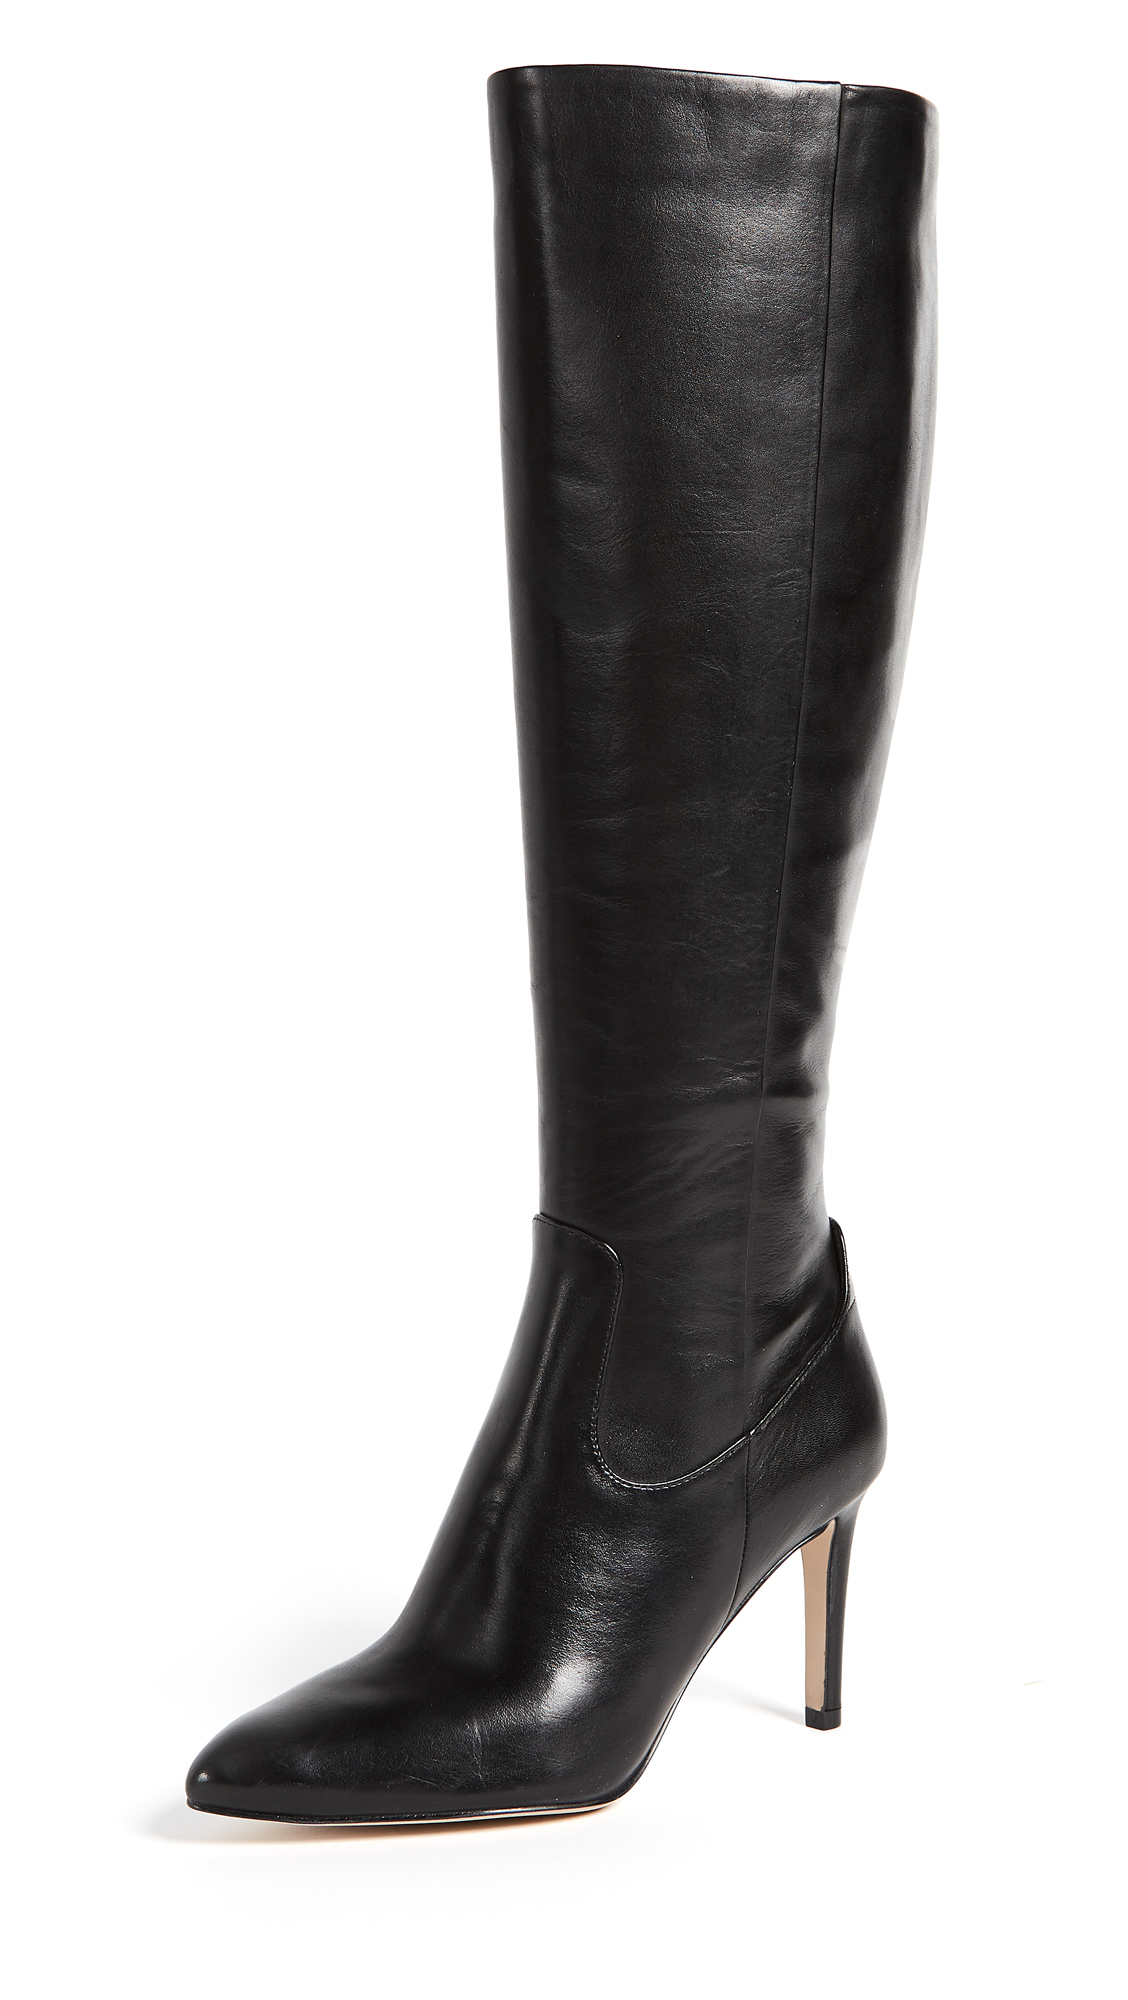 Sam Edelman Olencia Tall Boots - Black